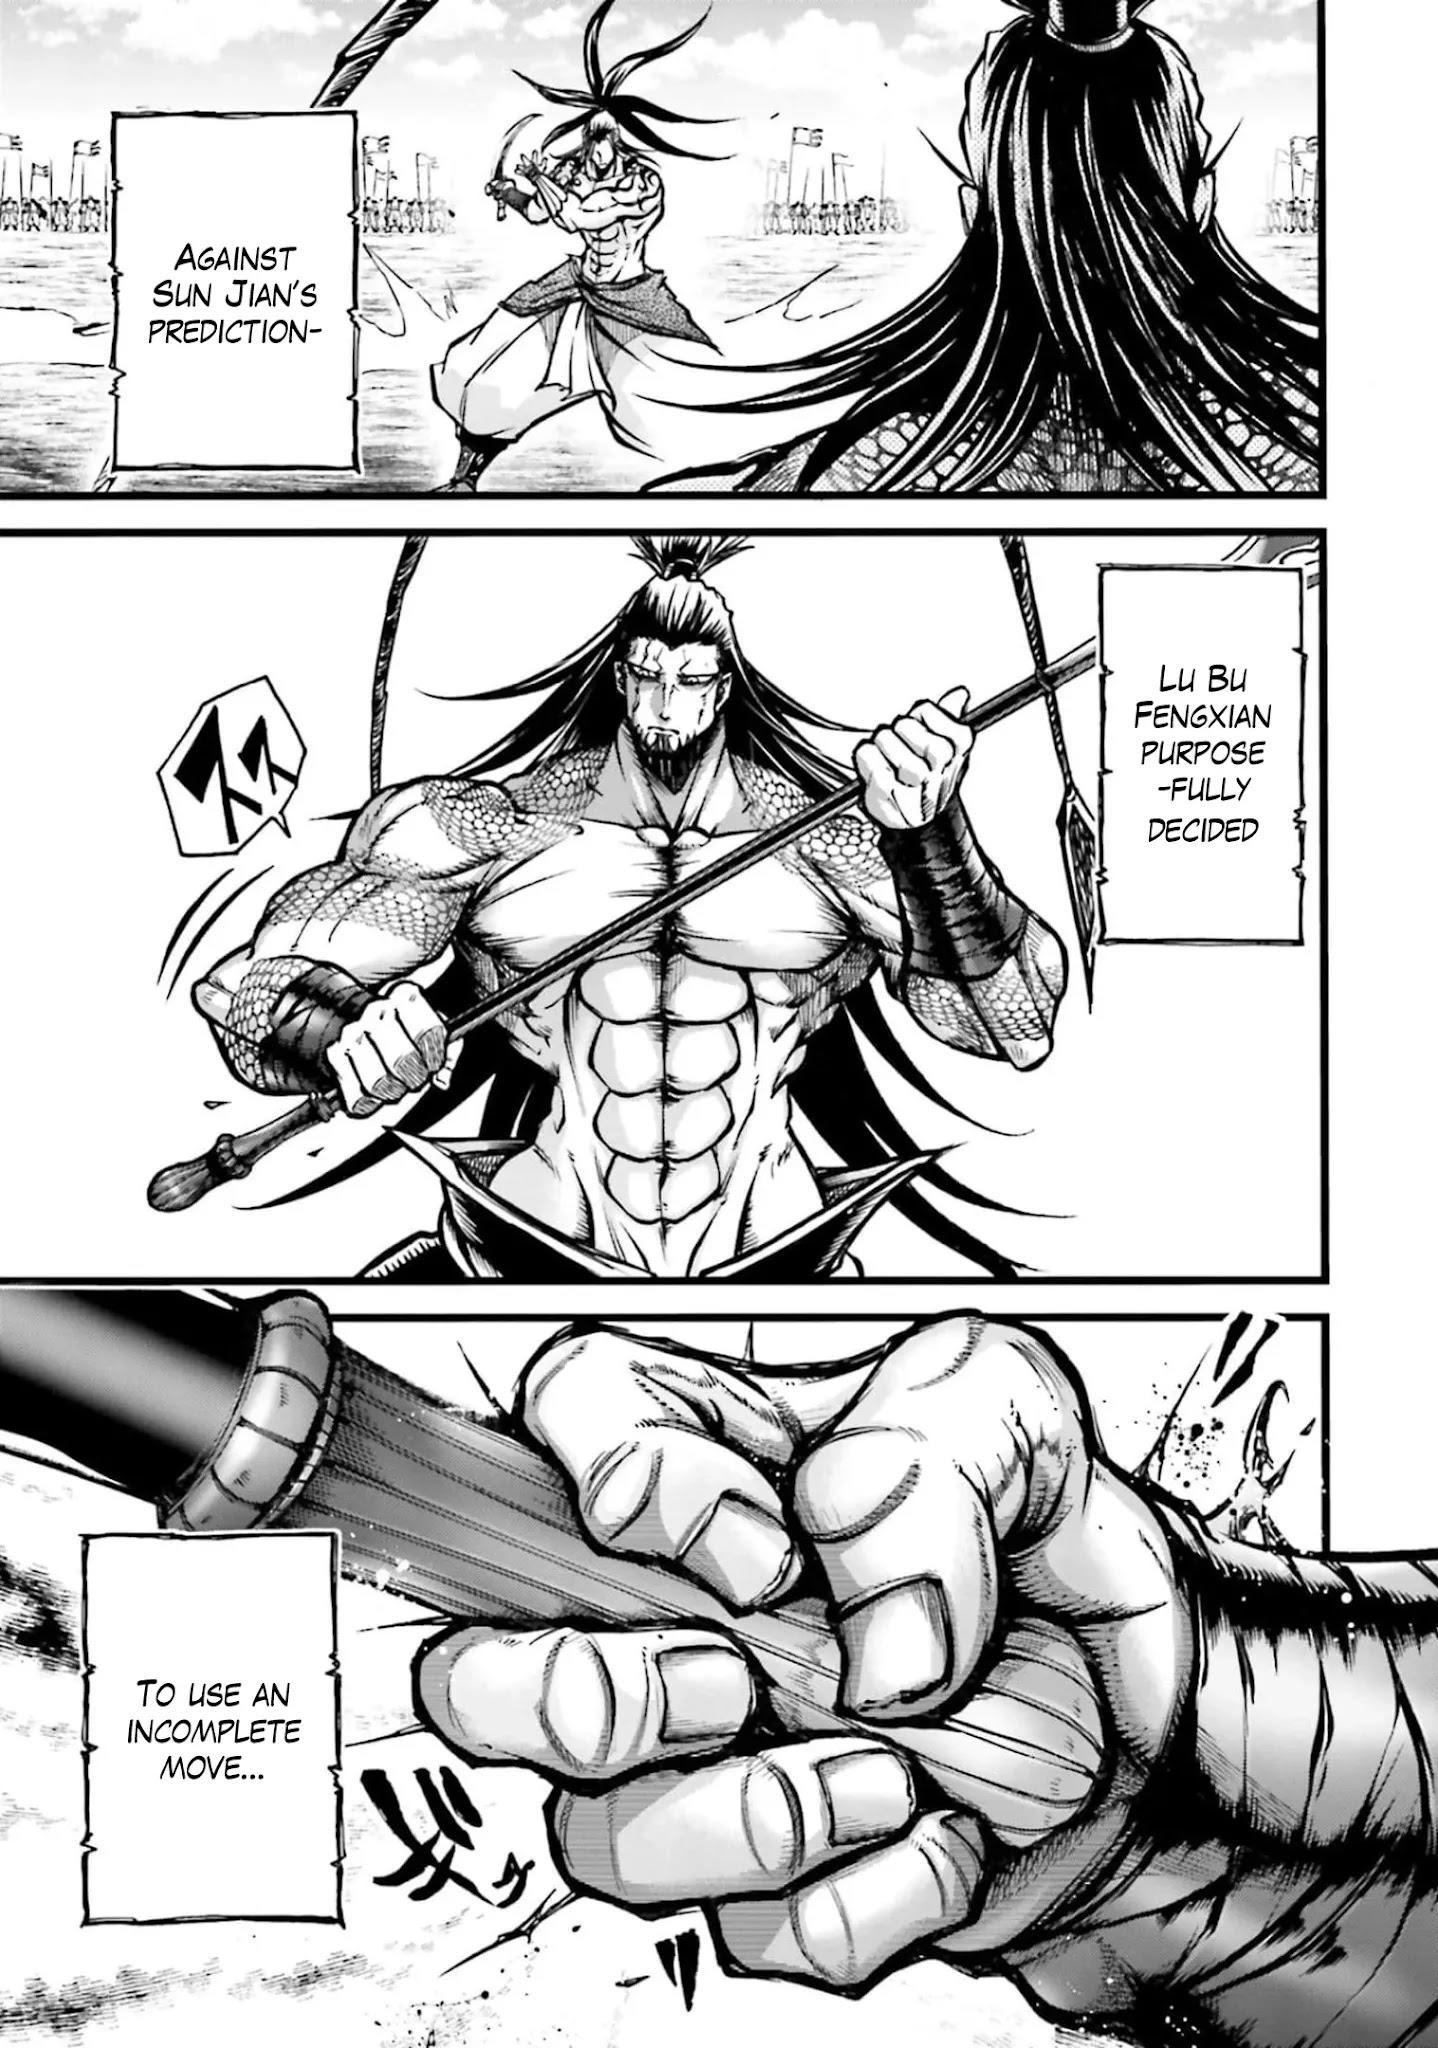 Shuumatsu No Valkyrie: The Legend Of Lu Bu Fengxian Chapter 8 page 17 - Mangakakalots.com